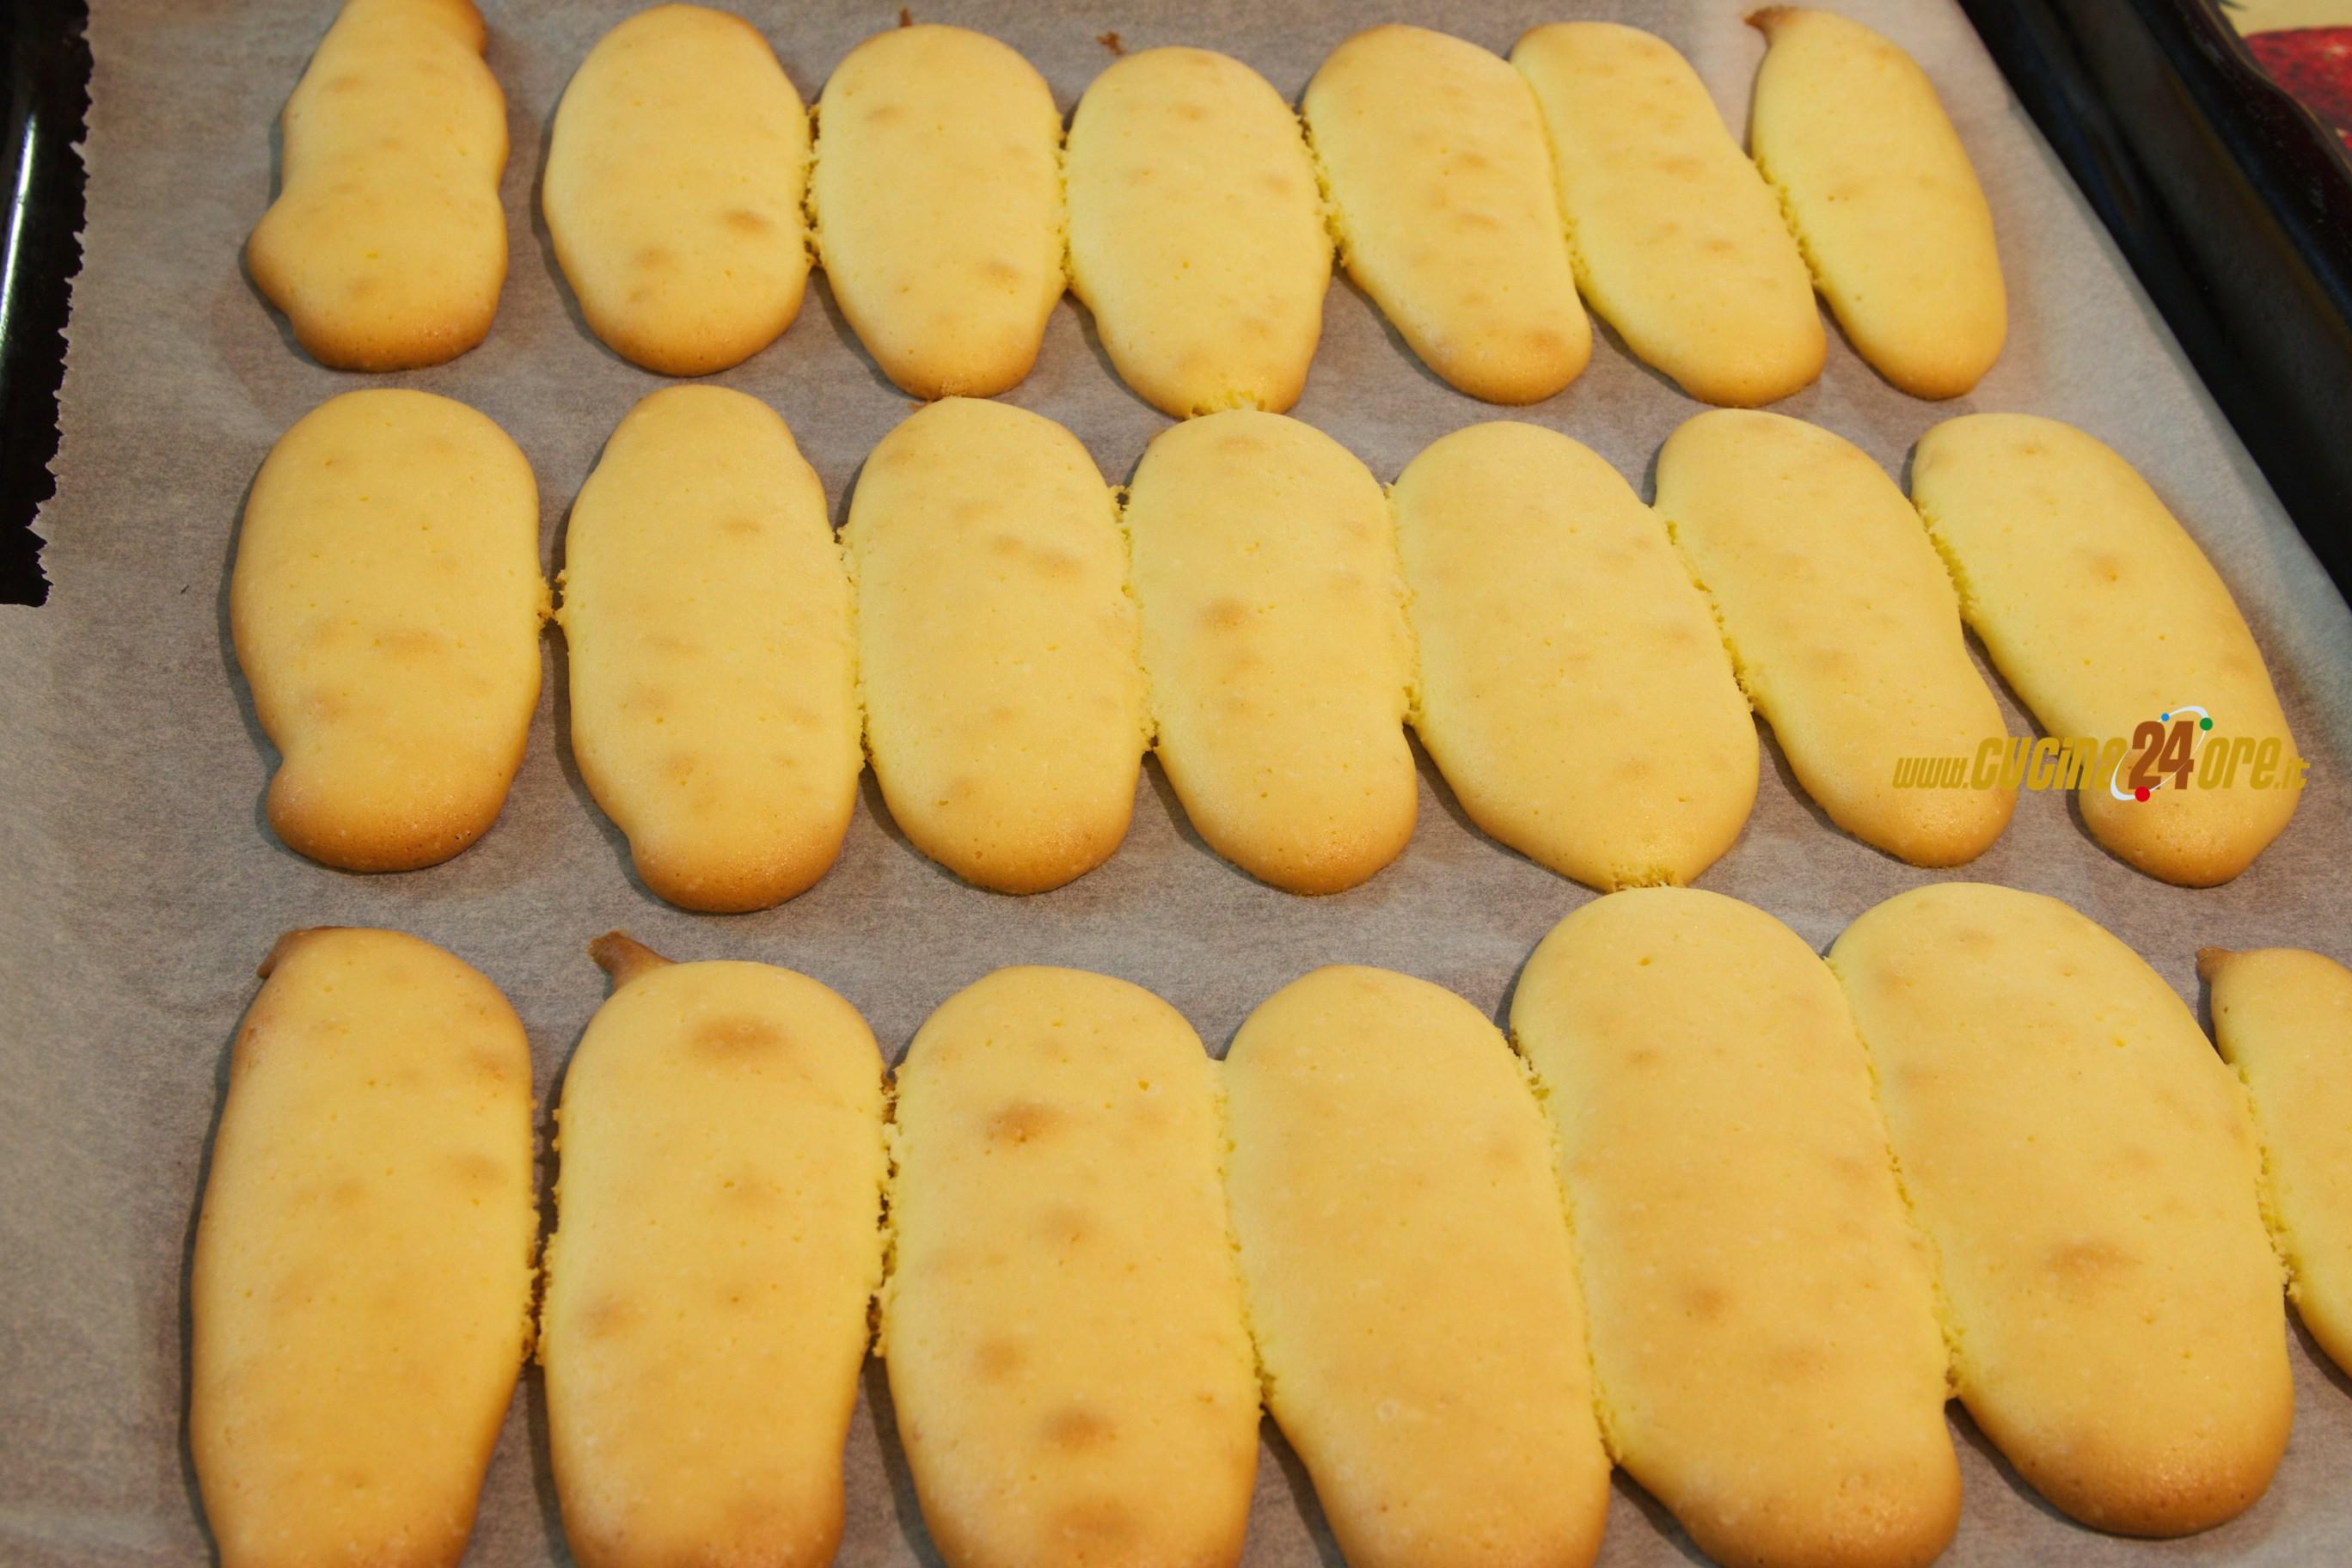 Ricetta Savoiardi Fatti In Casa Da Benedetta.Savoiardi Leggeri E Fraganti Senza Glutine Ricette Di Cucina